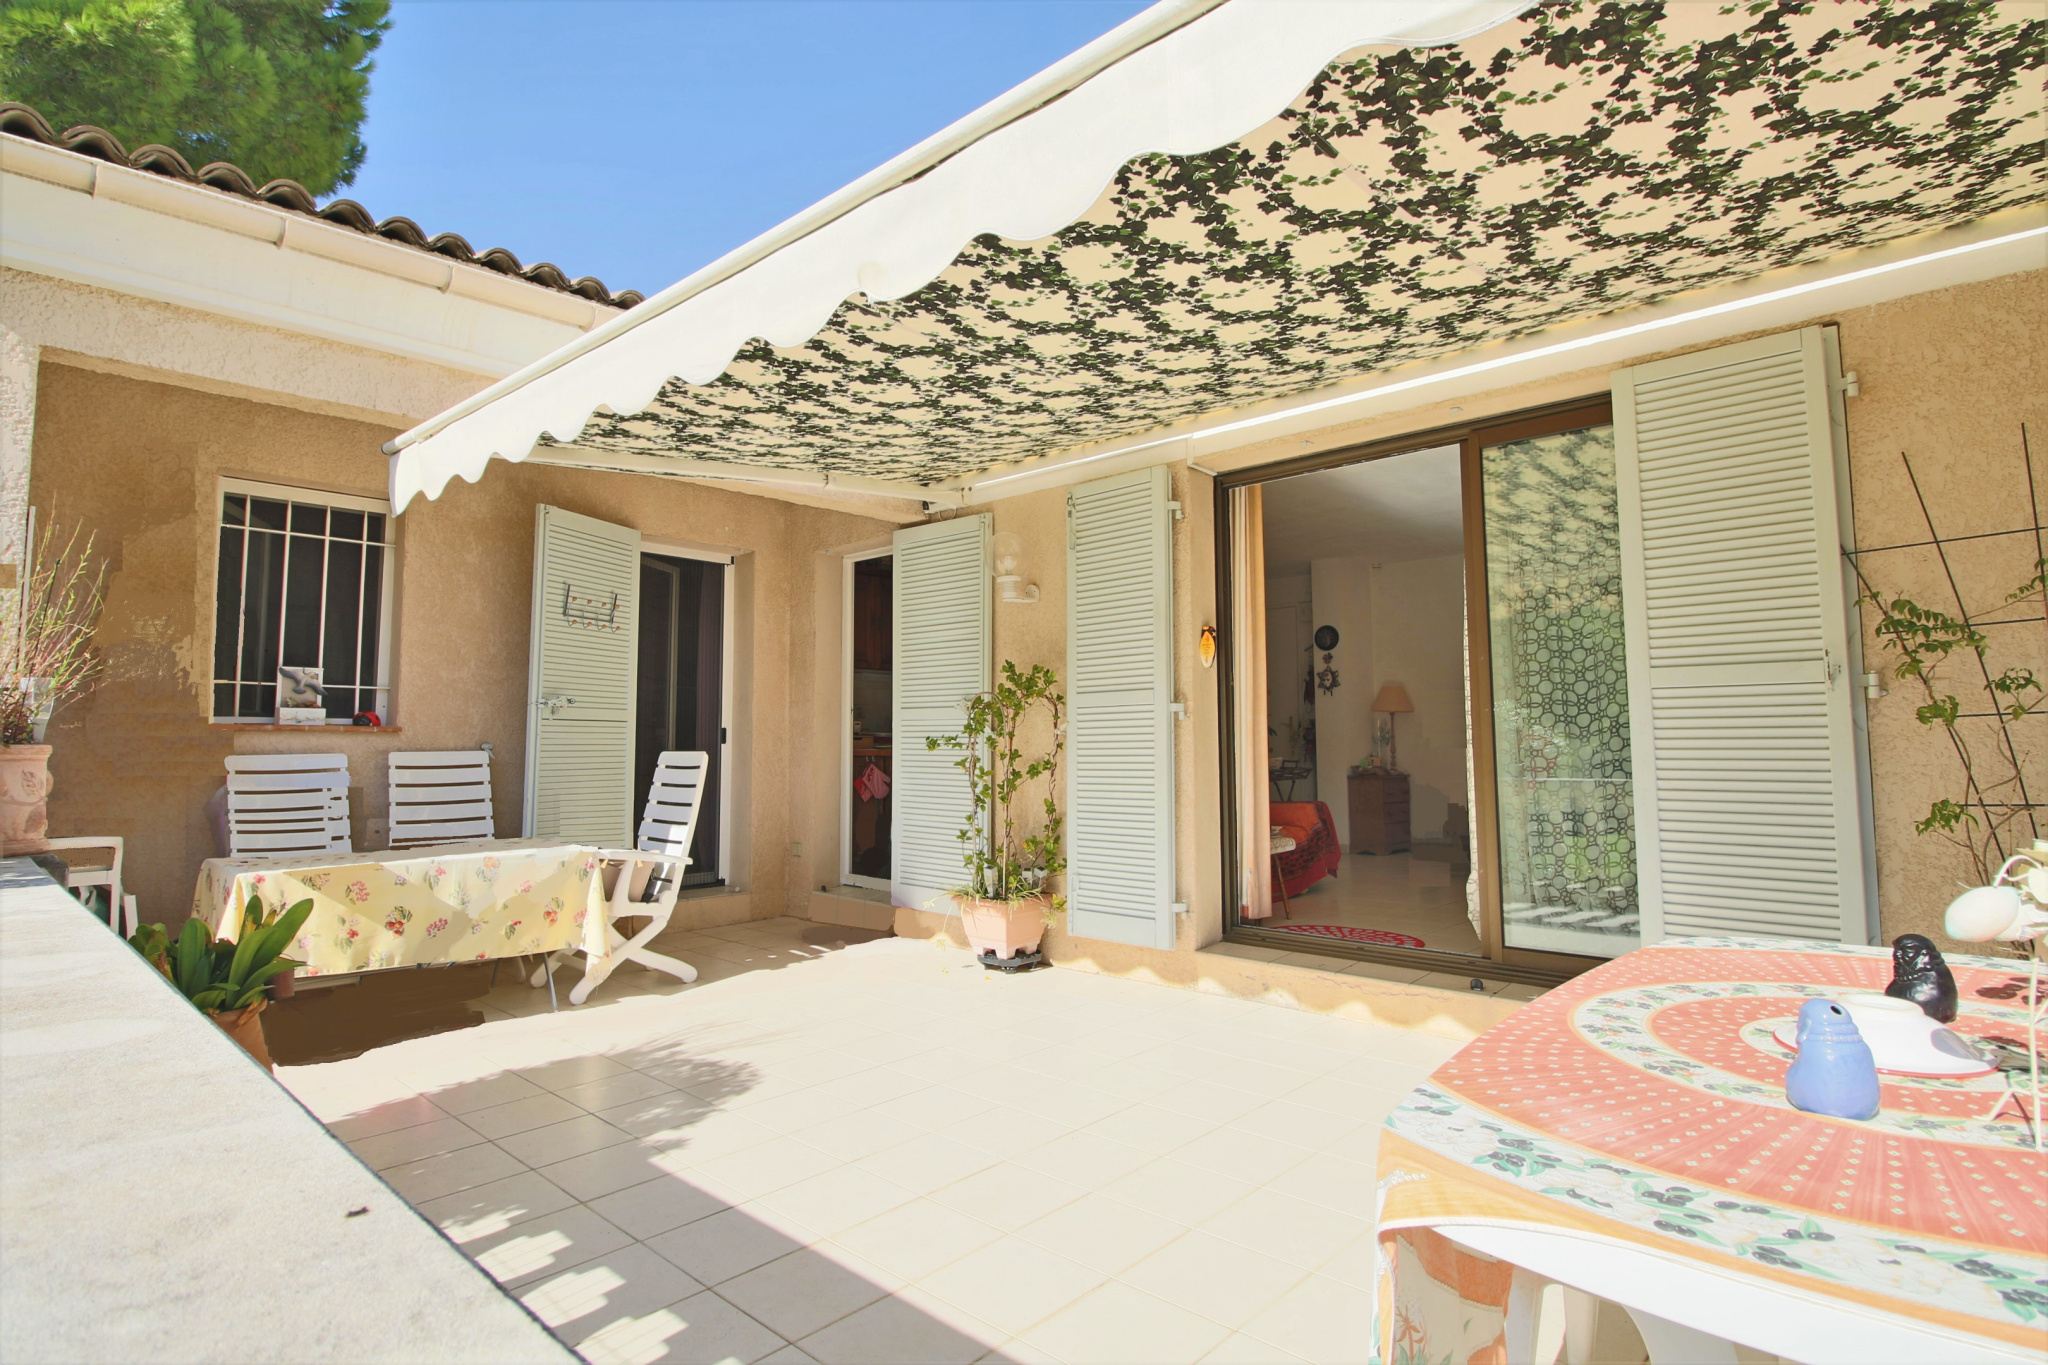 vente les hauts de vaugrenier villa patio 70m jardin garage terrasse. Black Bedroom Furniture Sets. Home Design Ideas